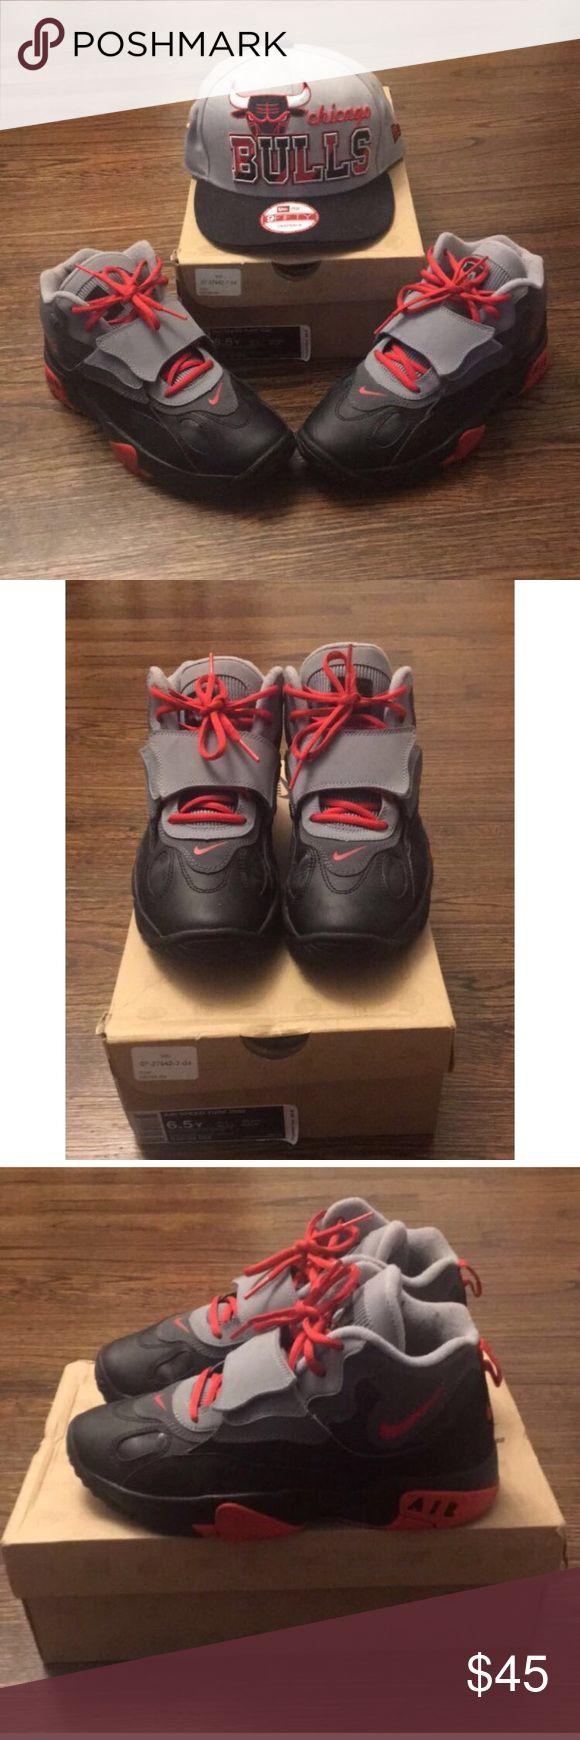 Nike Speed Turf Nike Speed Turf. University Red, Dark Grey & Black. Size 6.5Y. Original Box. Gently Worn. (Hat Can Be Purchased Separately) Nike Shoes Sneakers